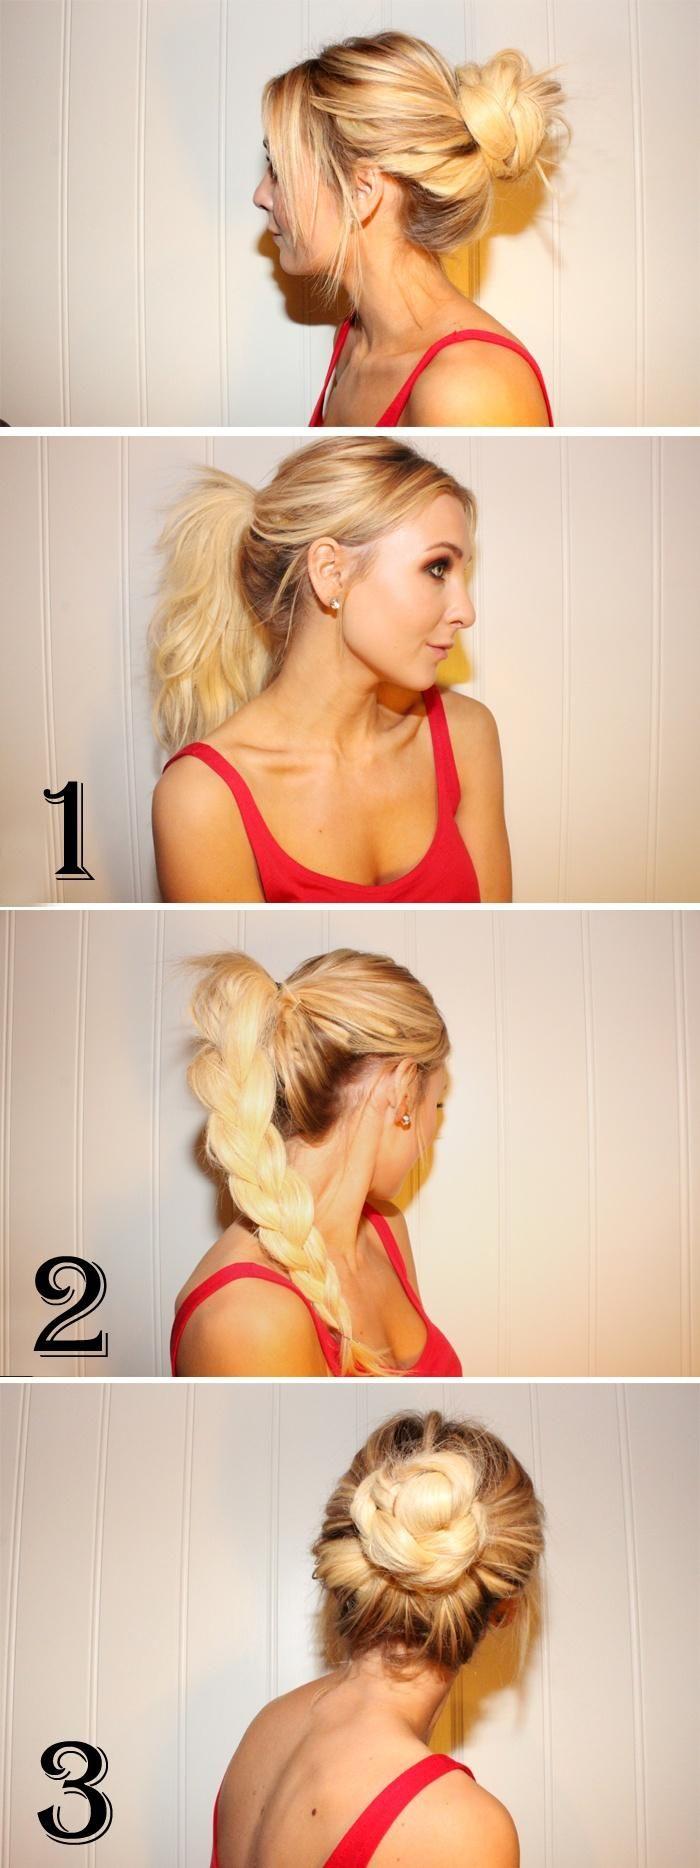 The Braid Bun - so simple and chic!